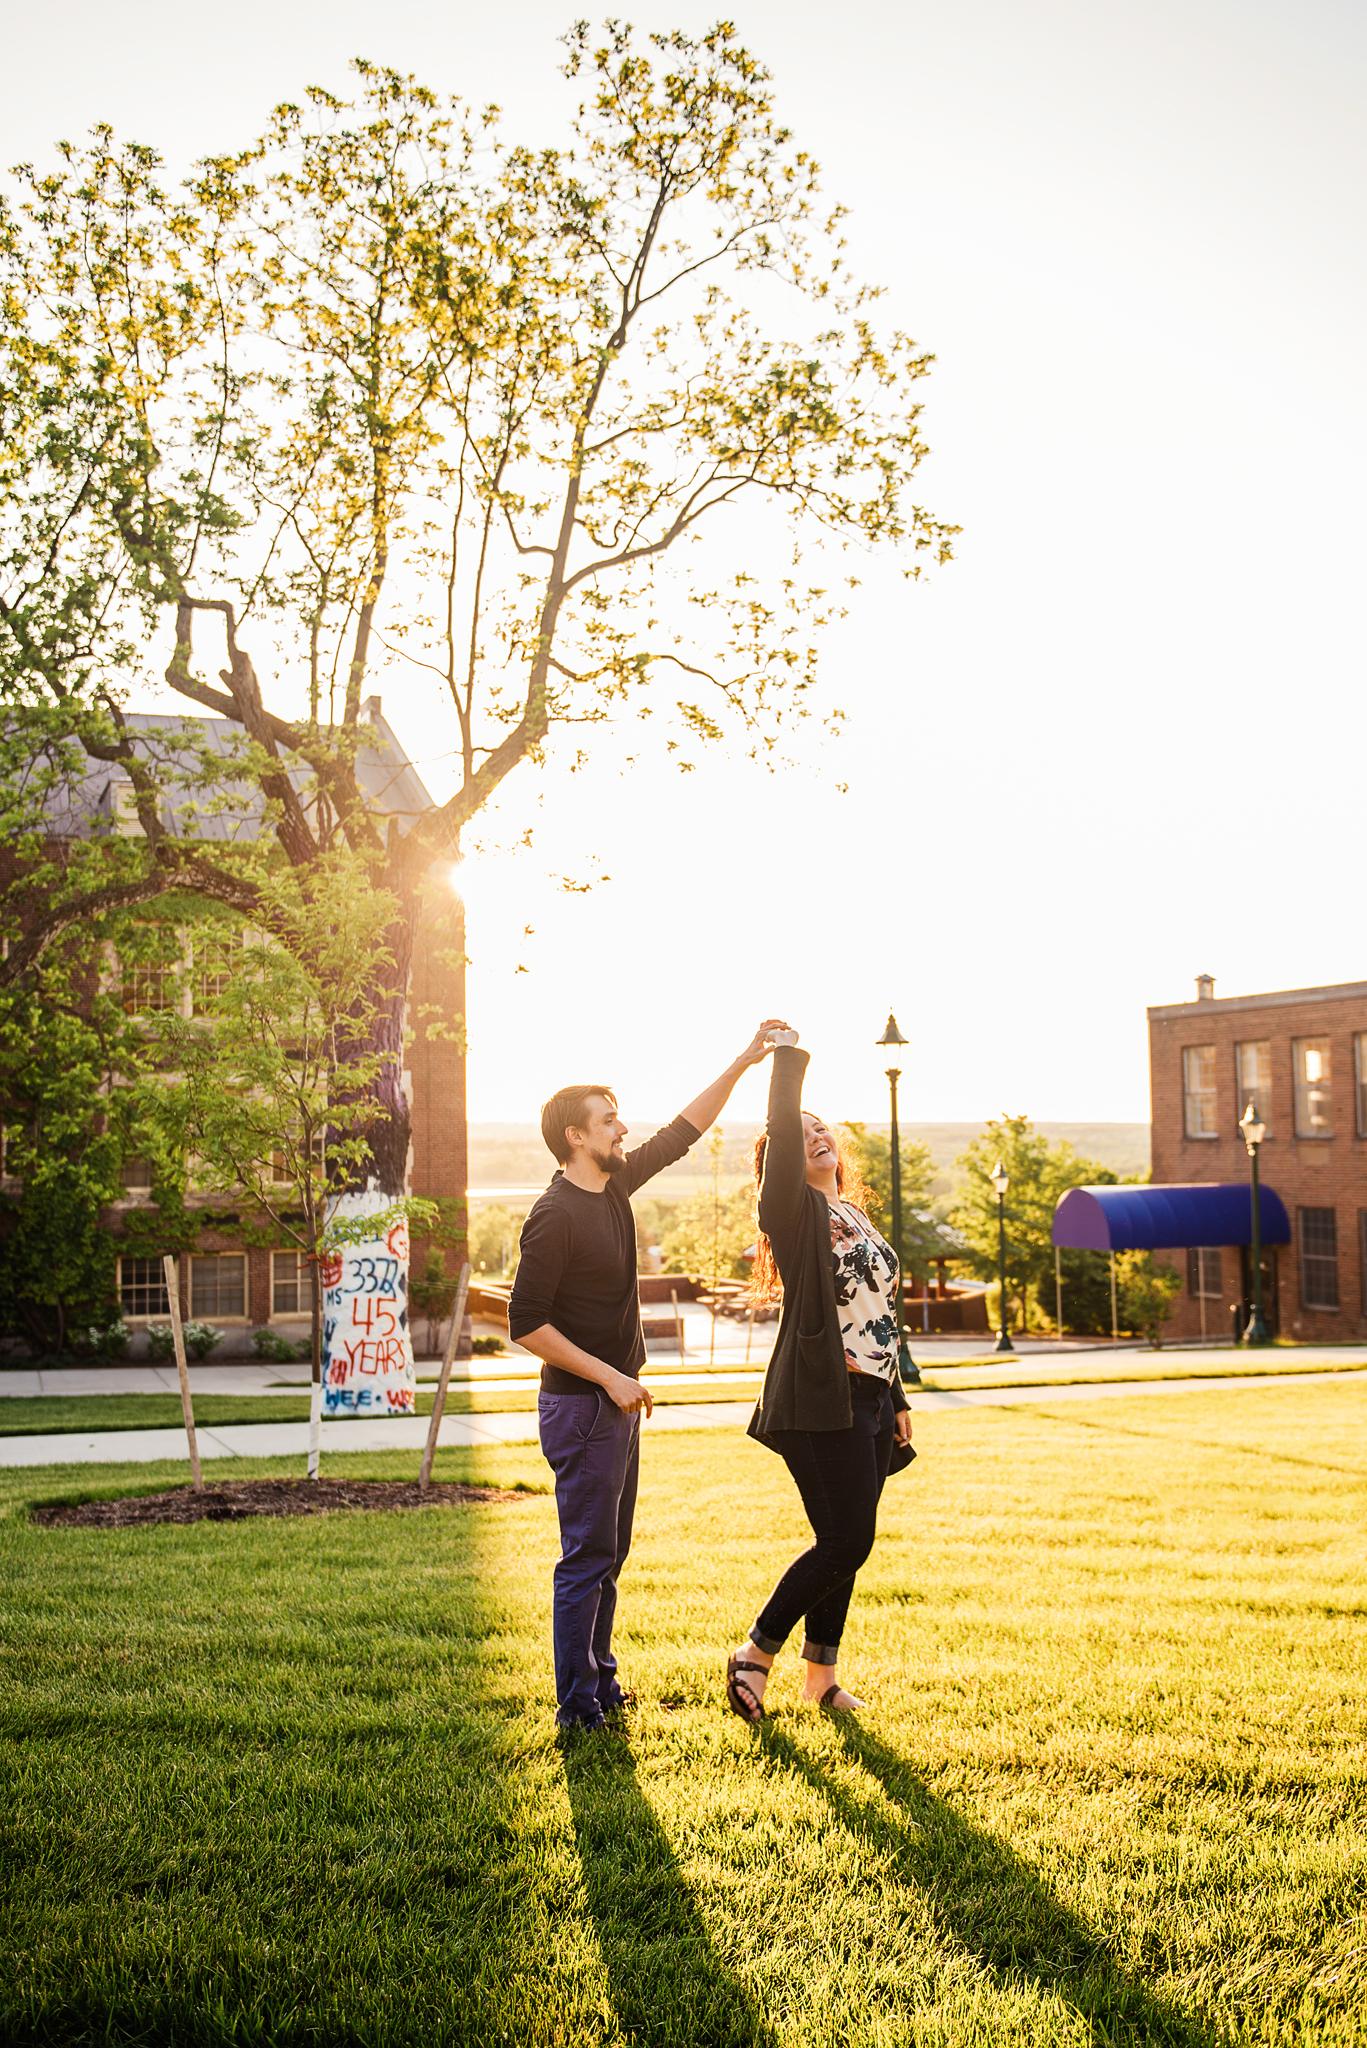 SUNY_Geneseo_Rochester_Engagement_Session_JILL_STUDIO_Rochester_NY_Photographer_DSC_0973.jpg